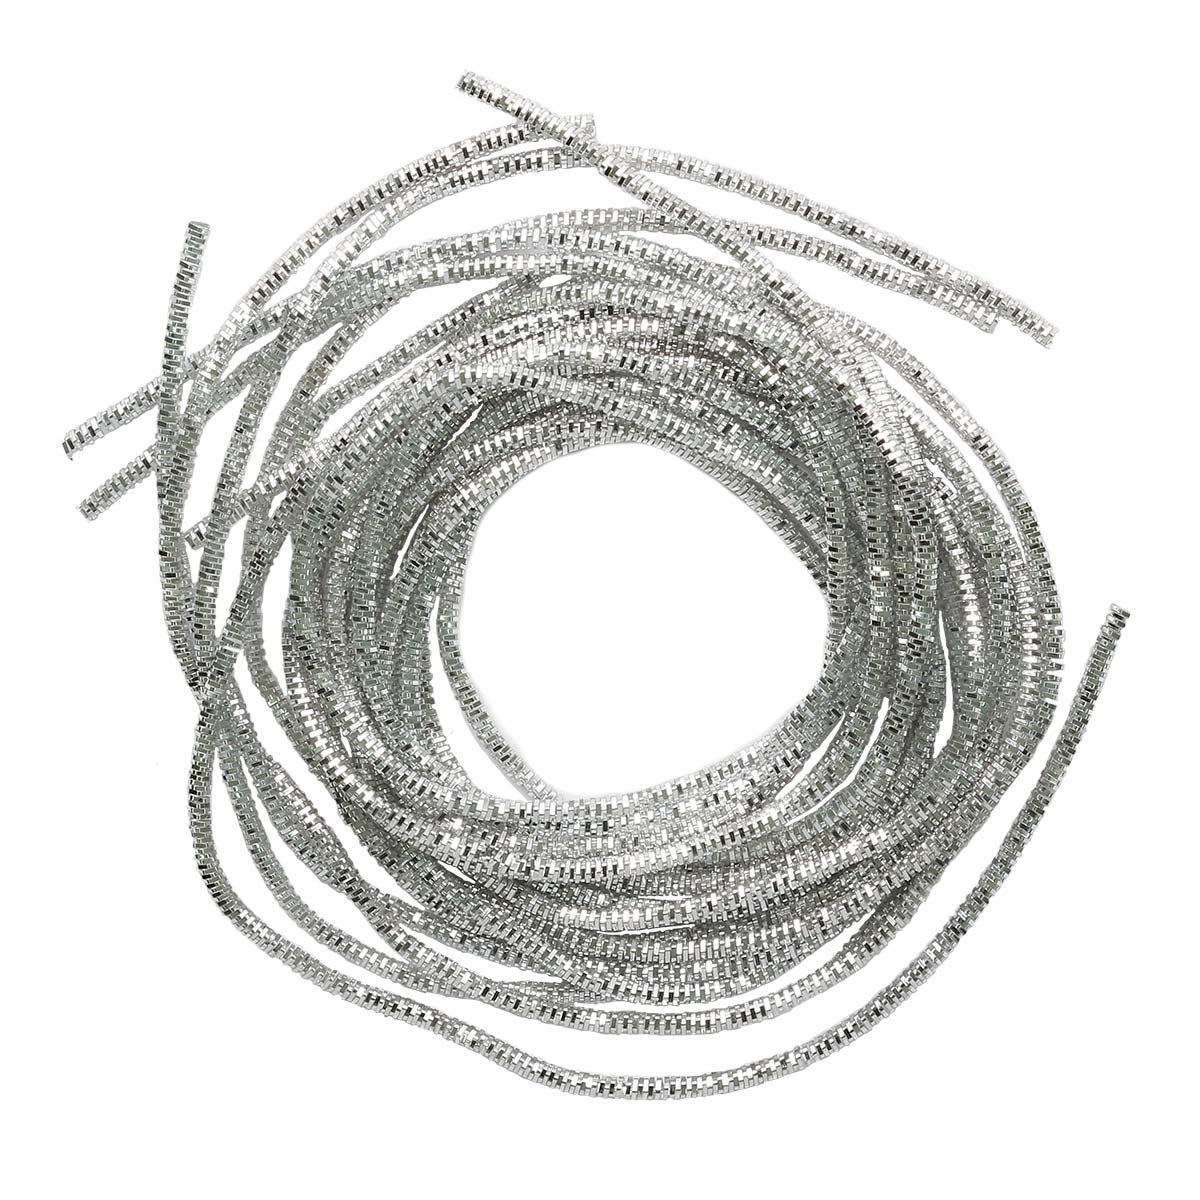 ТК002НН1 Трунцал медный,серебро 1,5 мм, 5 гр/упак Астра